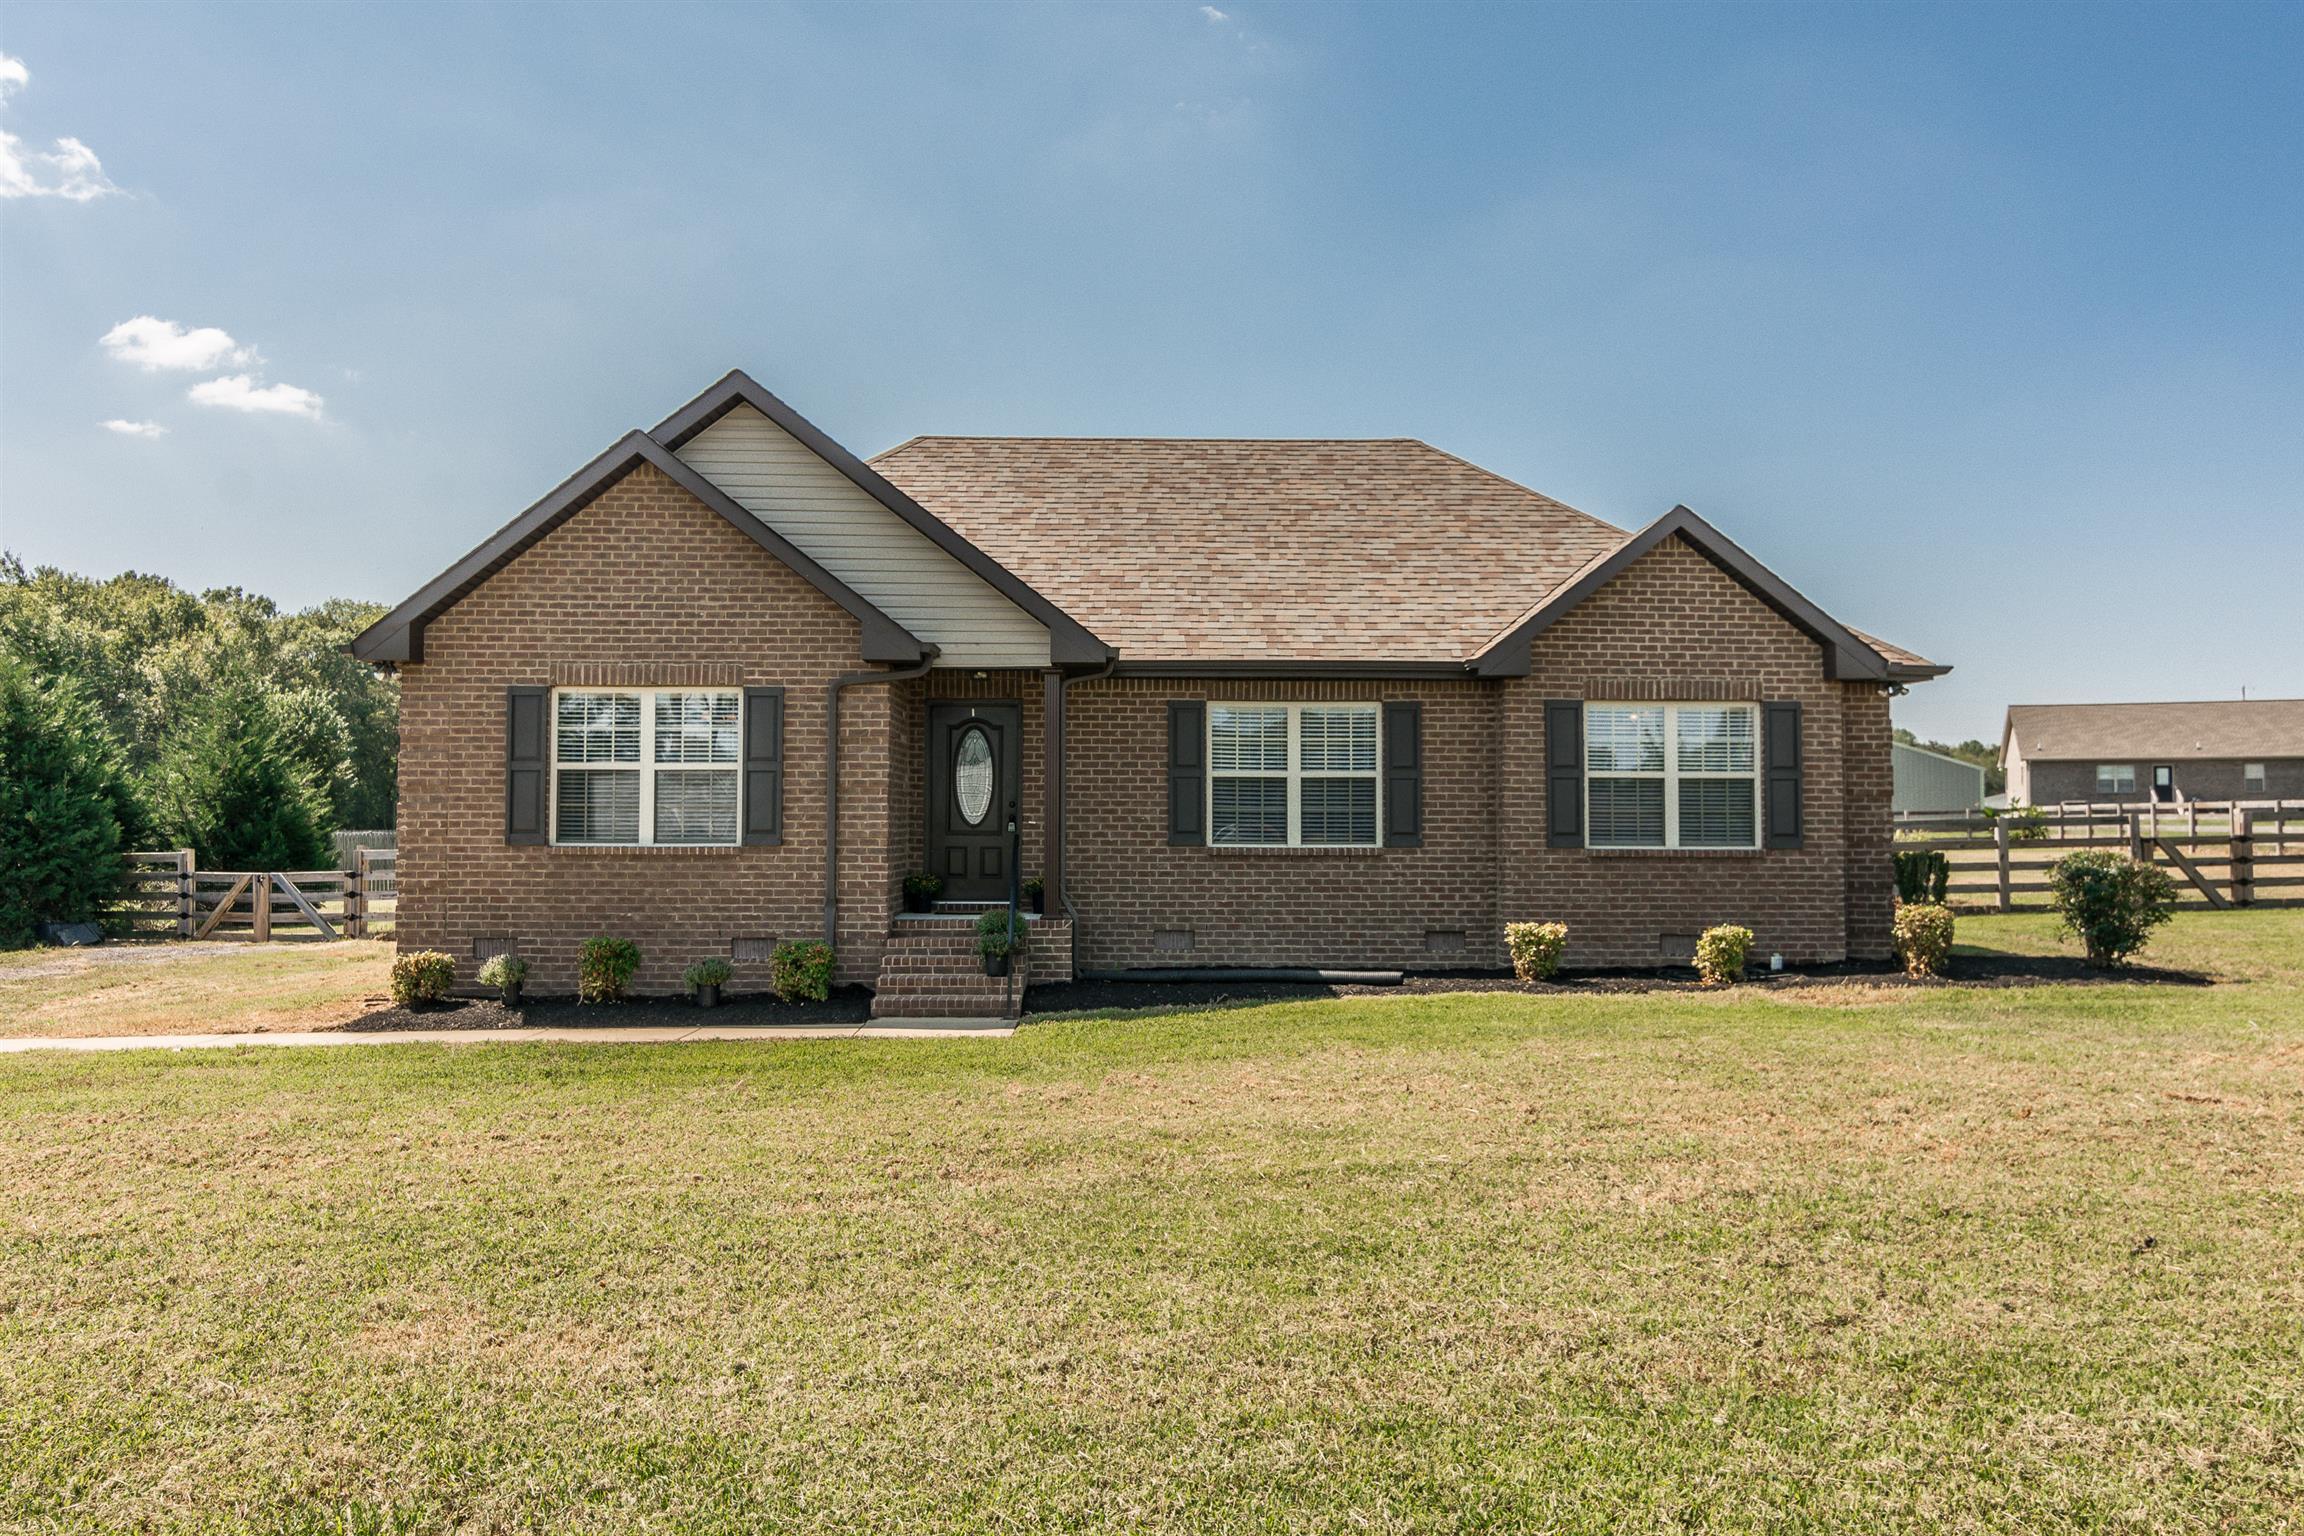 5575 Highway 231 S, Castalian Springs, TN 37031 - Castalian Springs, TN real estate listing